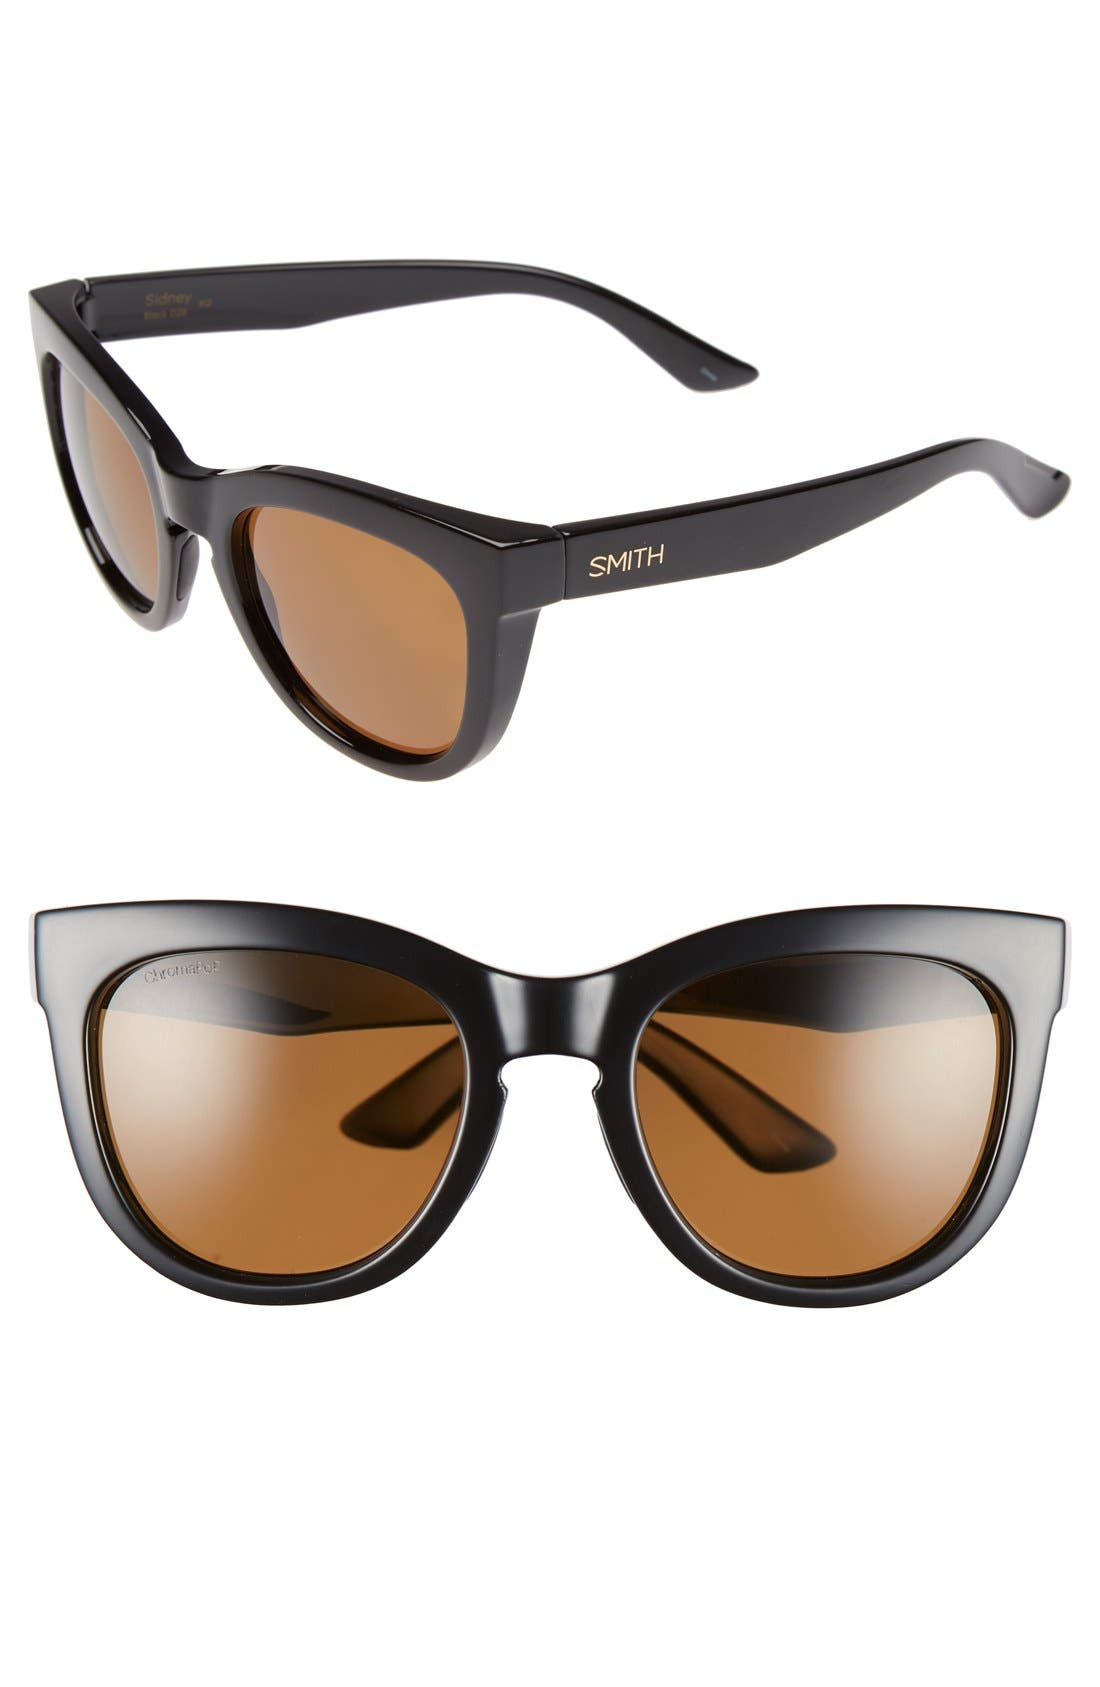 Smith 'Sidney' 55mm Polarized Sunglasses